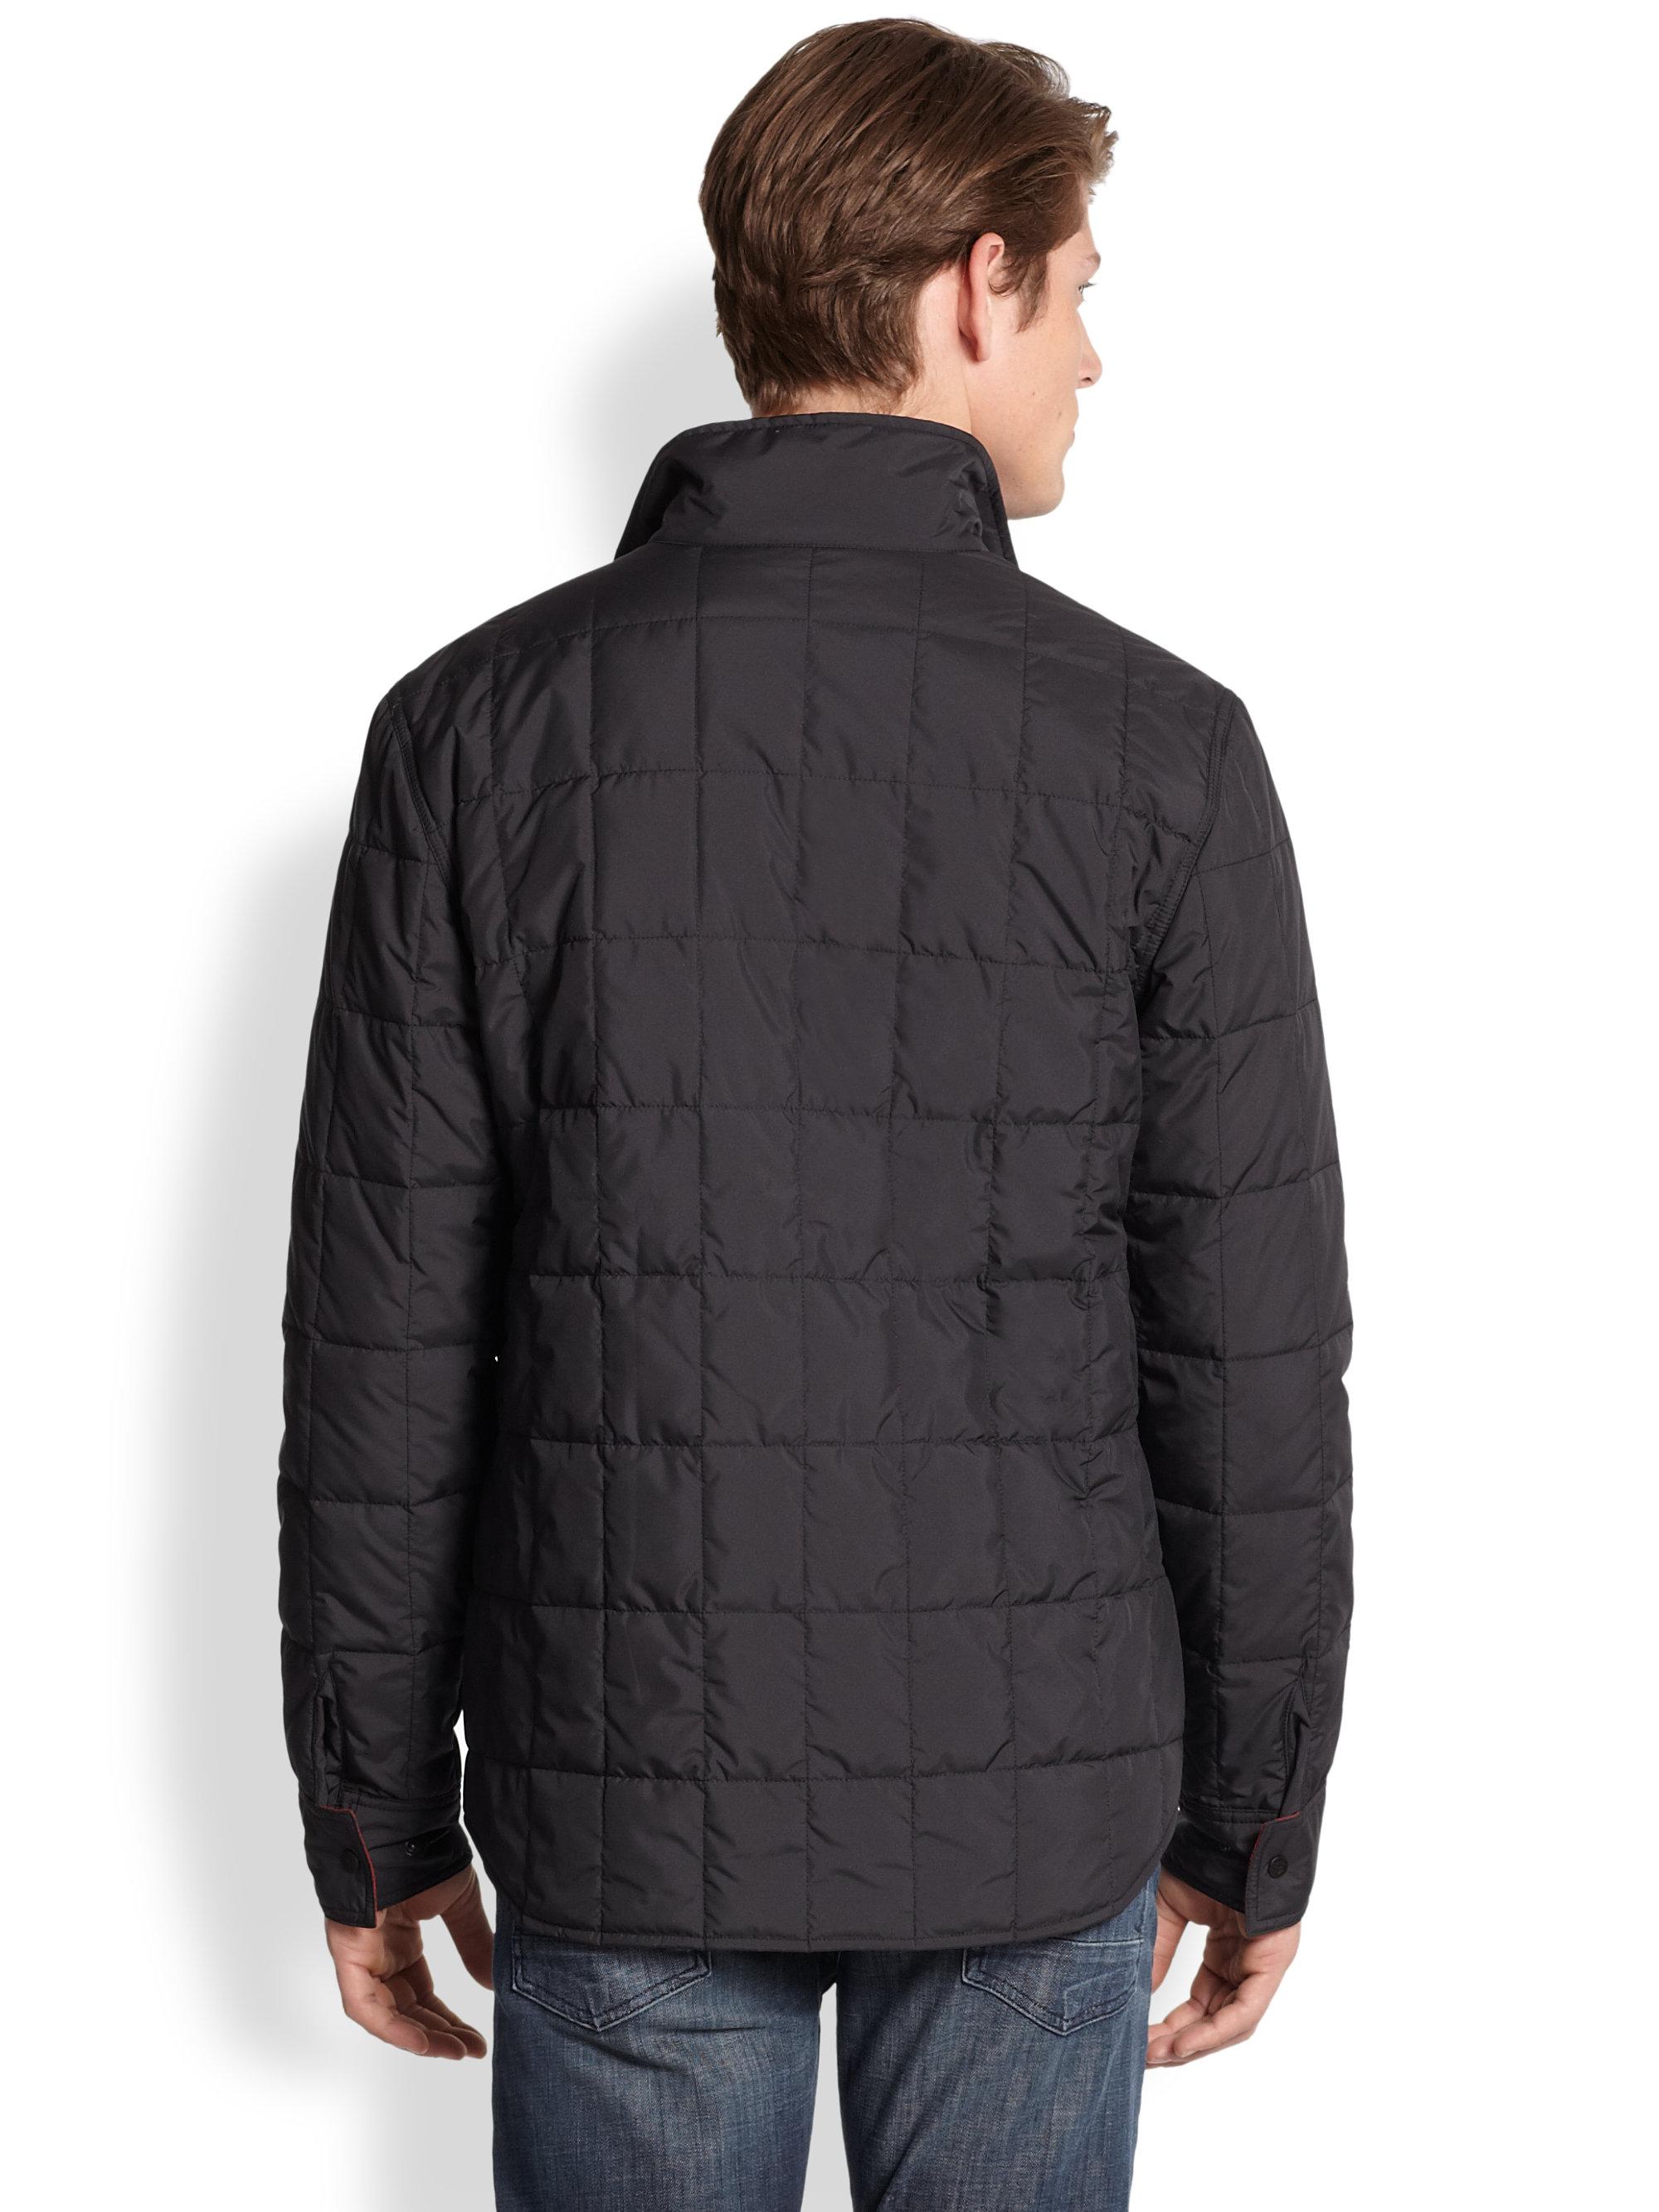 Victorinox men's zermatt utility shirt jacket